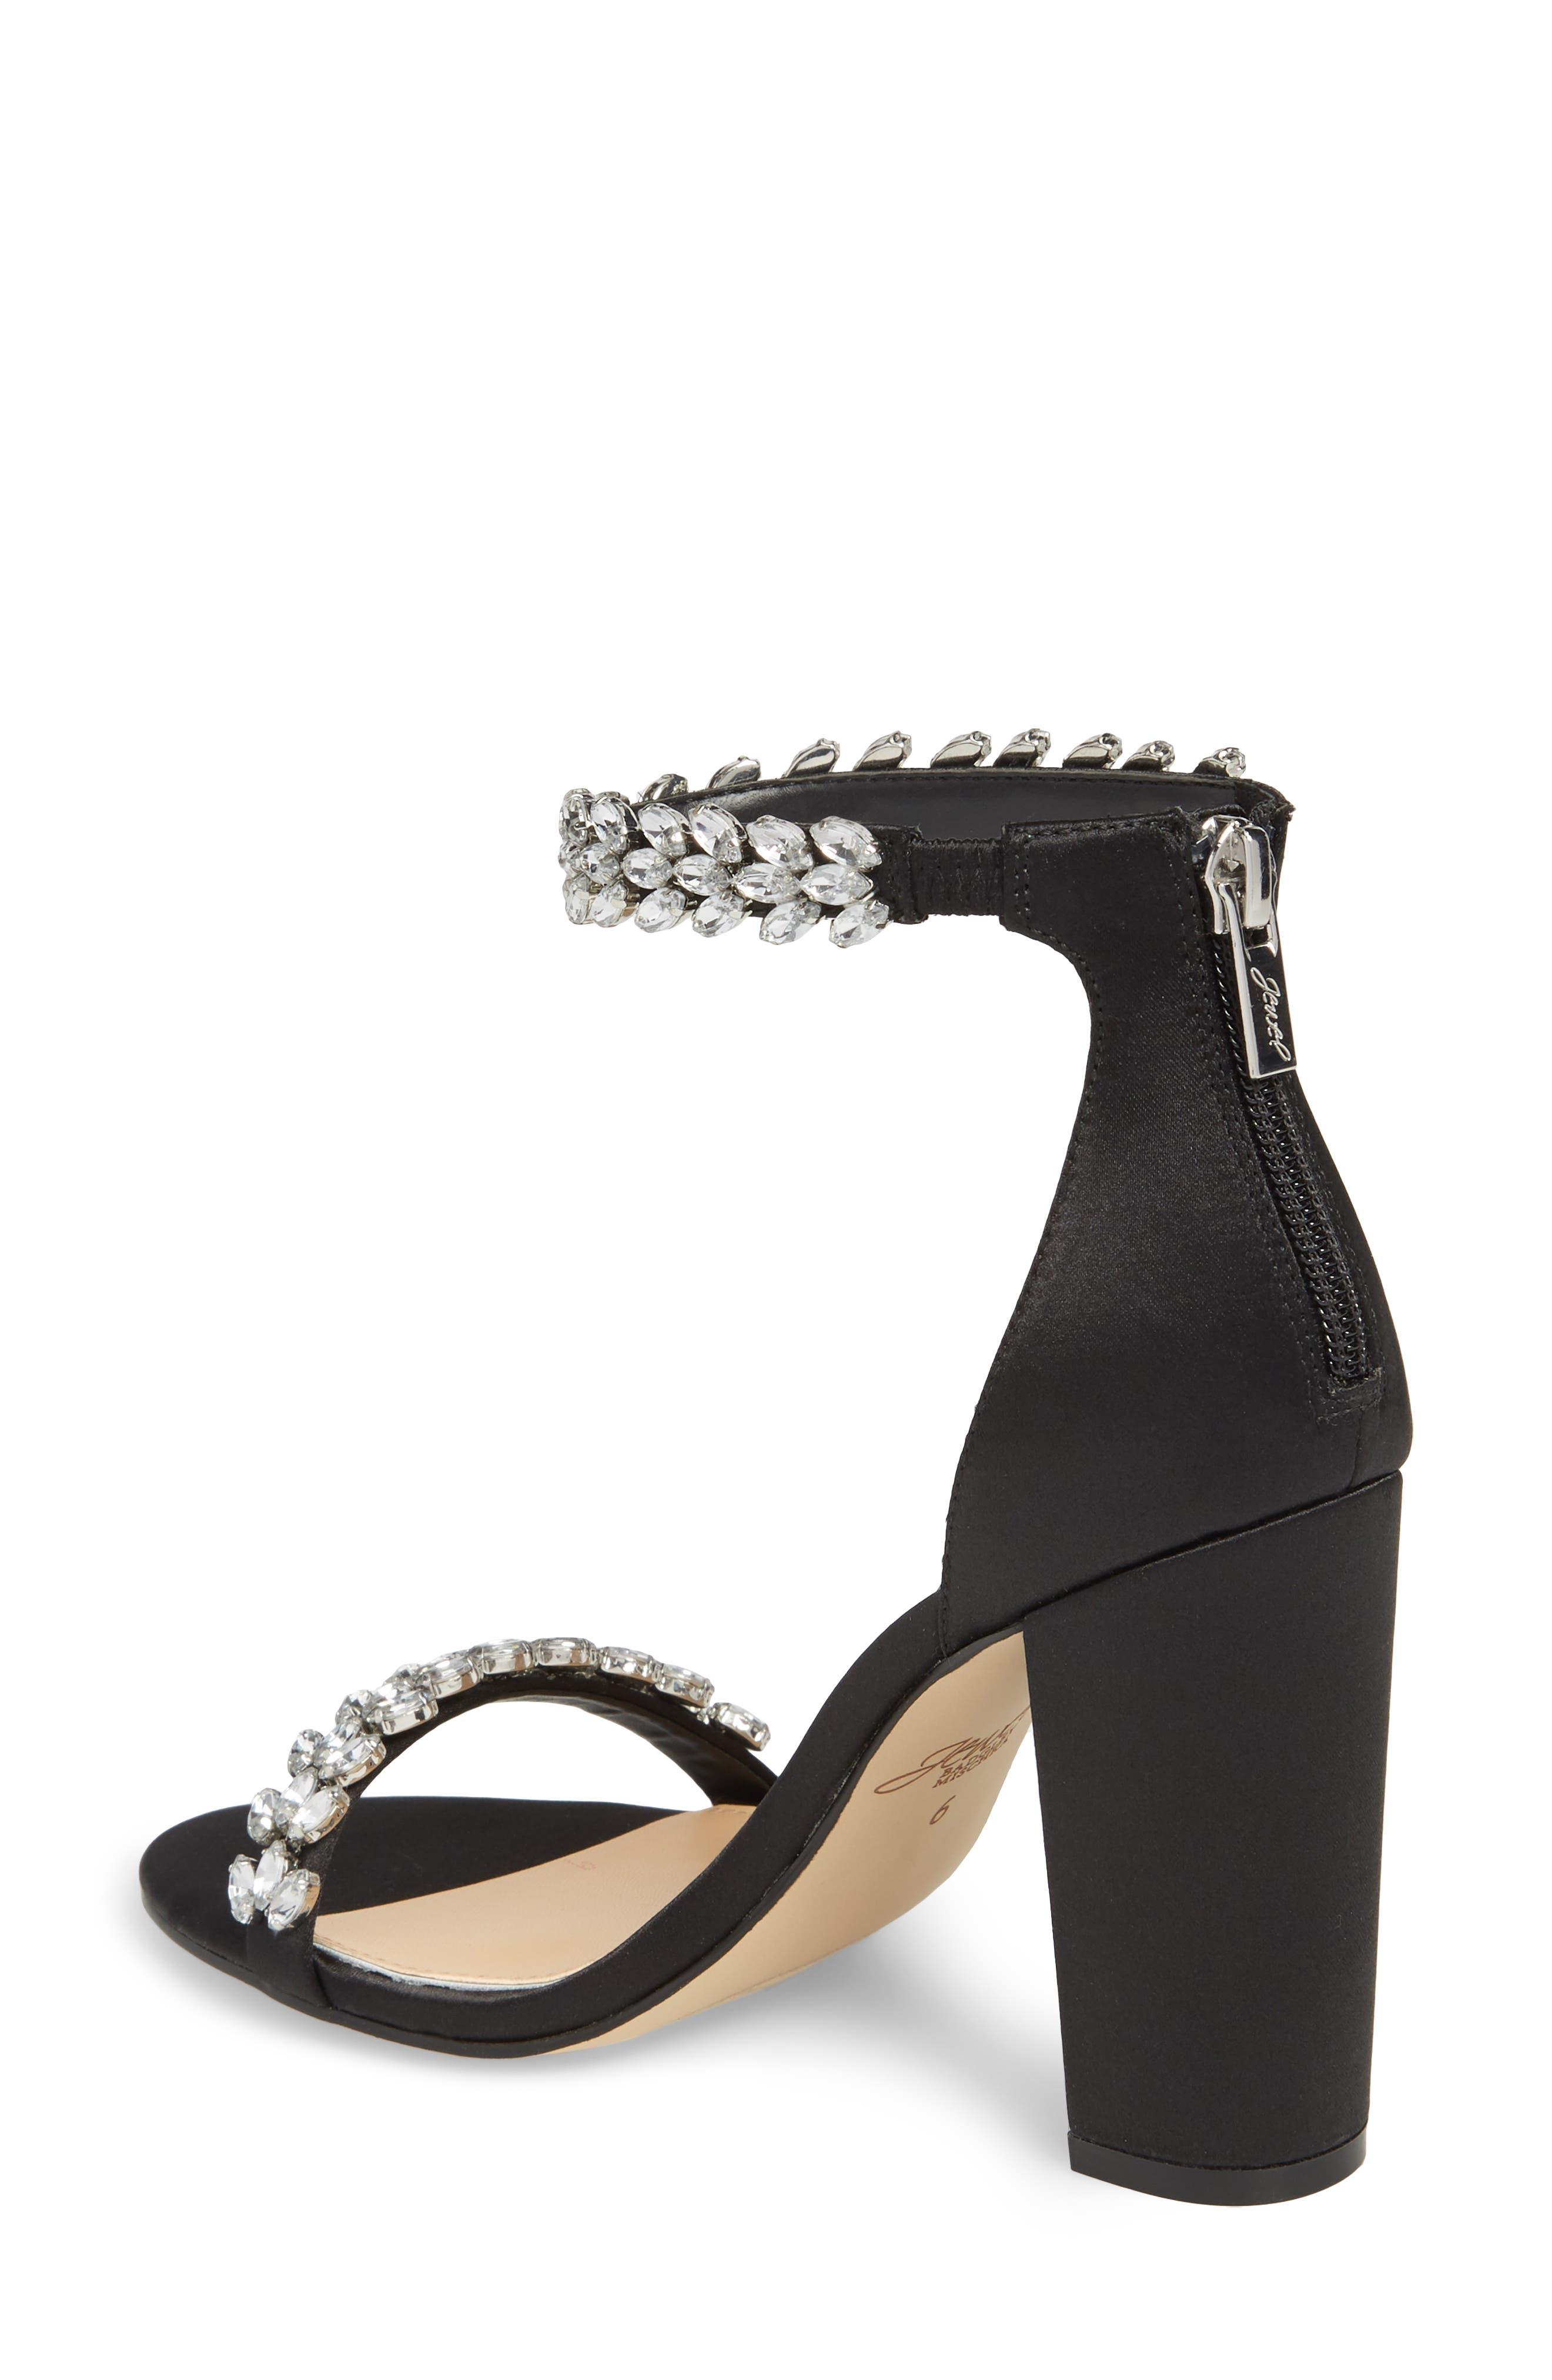 Jewel by Badgley Mischka Mayra Embellished Ankle Strap Sandal,                             Alternate thumbnail 2, color,                             BLACK SATIN